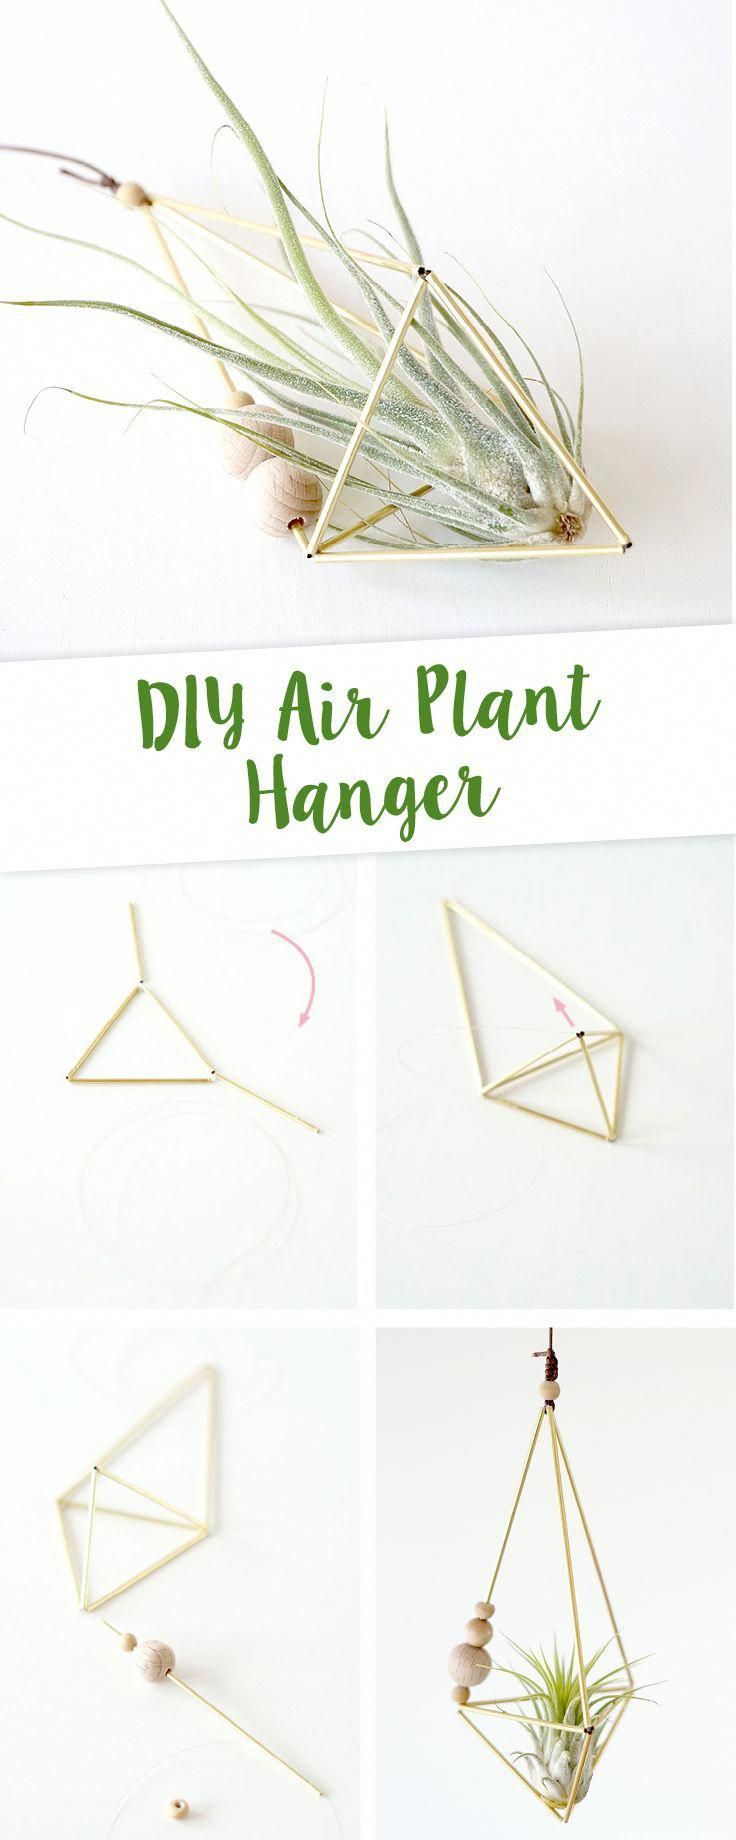 Easy DIY for an Air Plant Hanger on www.aentschiesblo ... #aentschiesblo #hanger #plant #diygartenprojekte